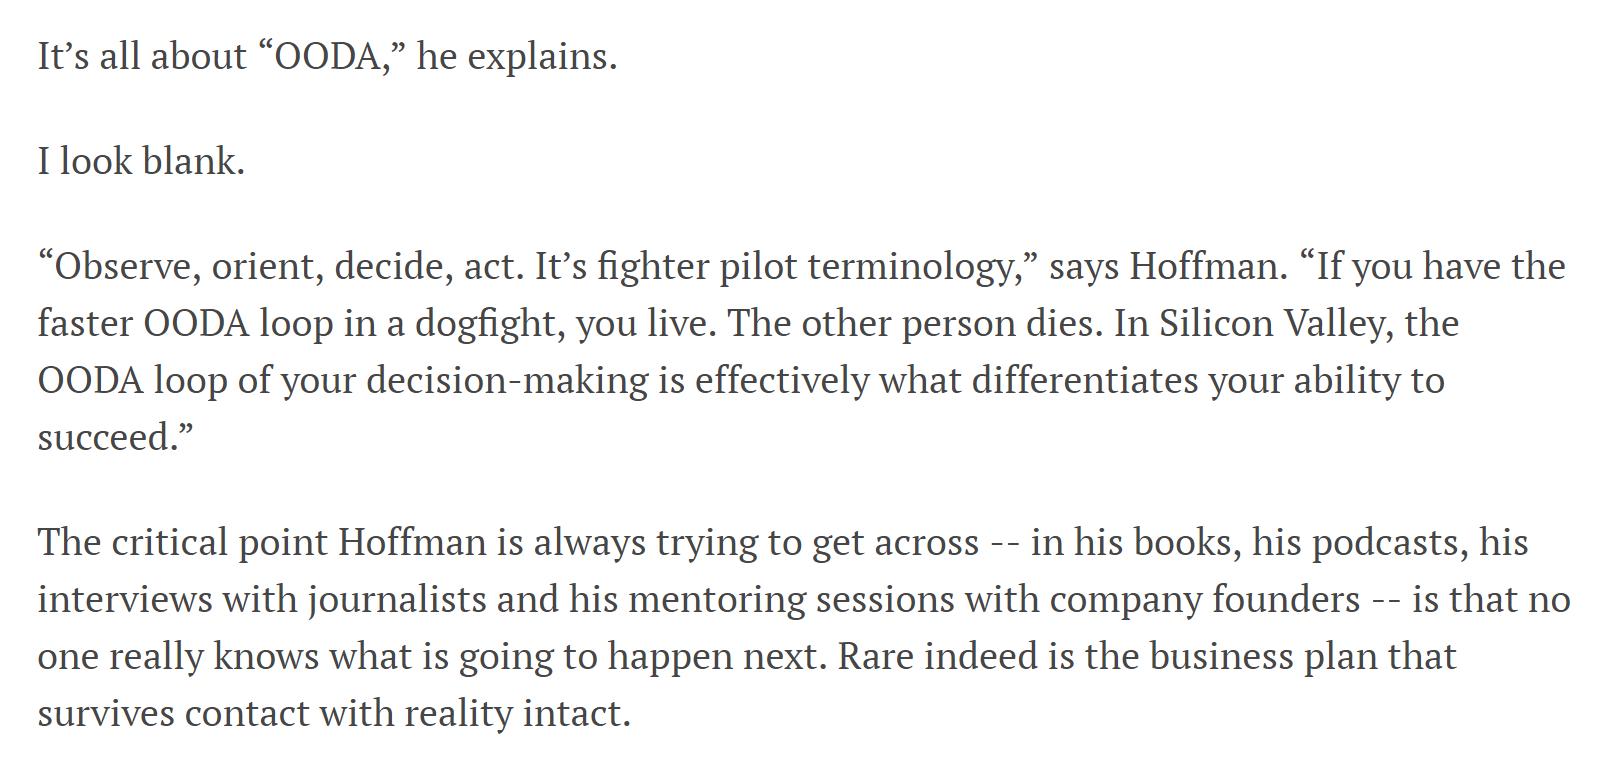 Reid Hoffman talks about the OODA Loop in this piece from Entrepreneur.com